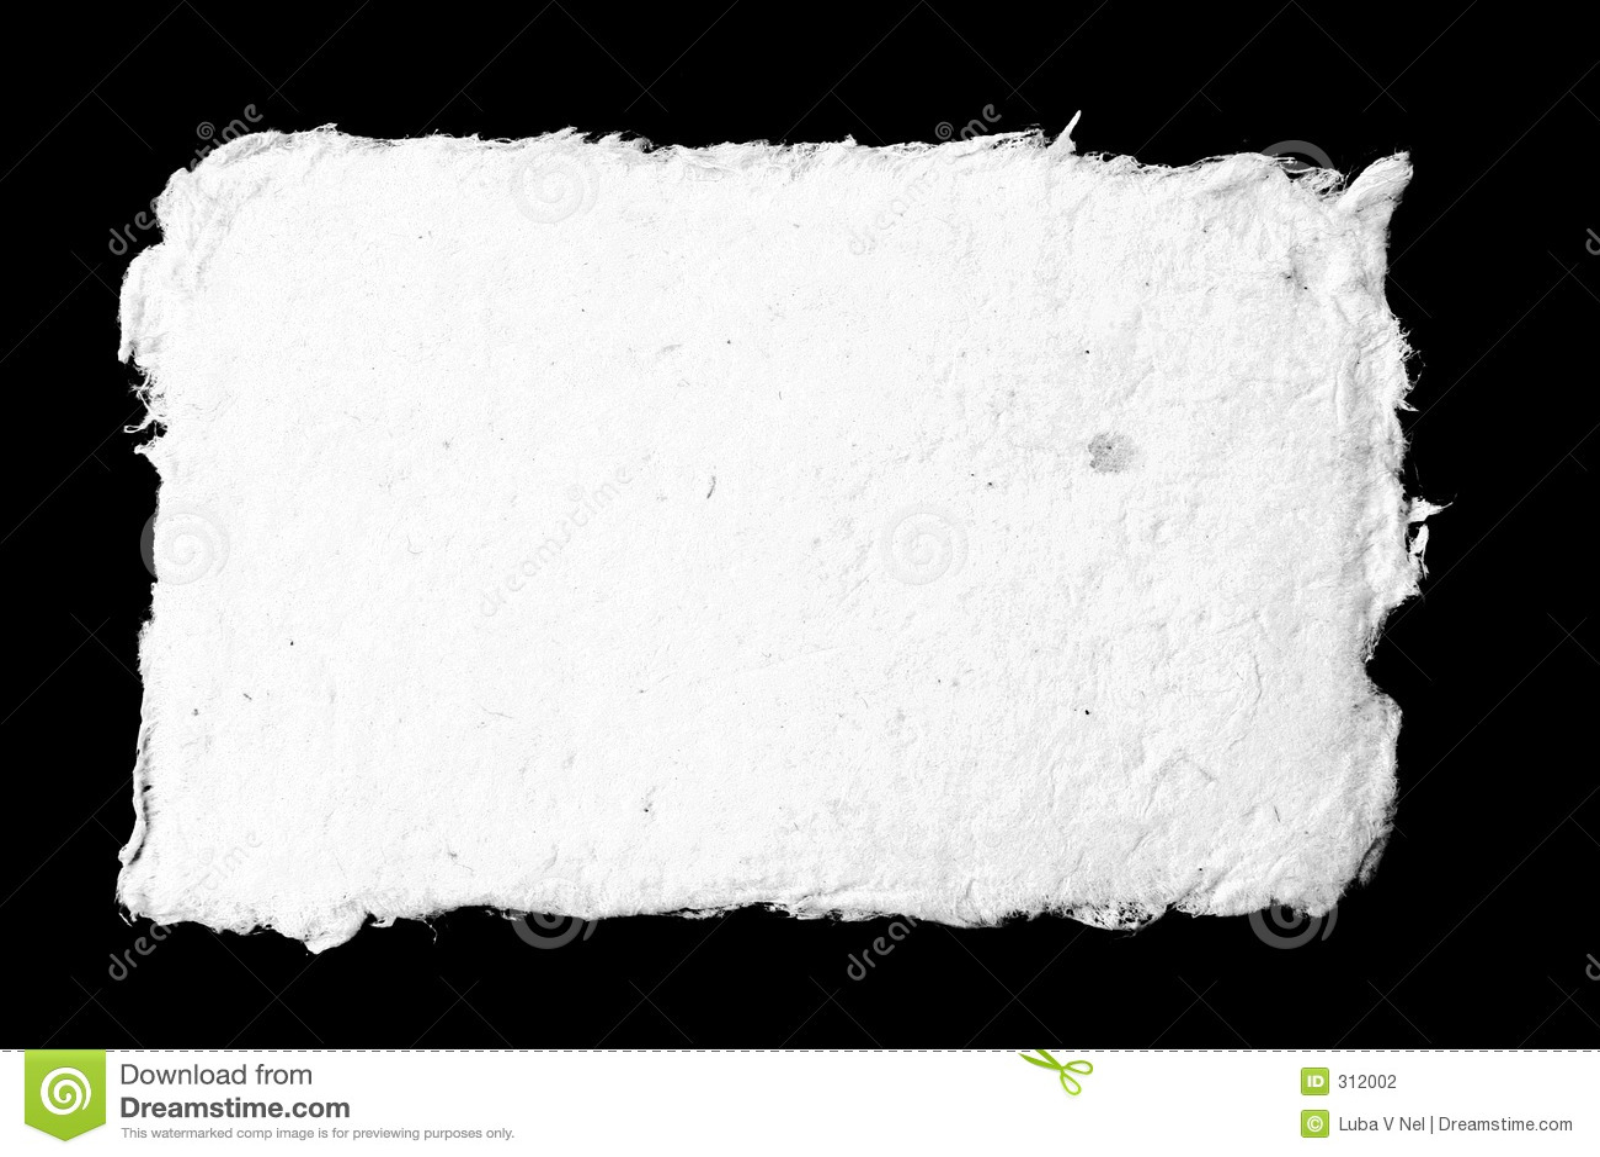 grunge torn edges paper stock illustration. illustration of